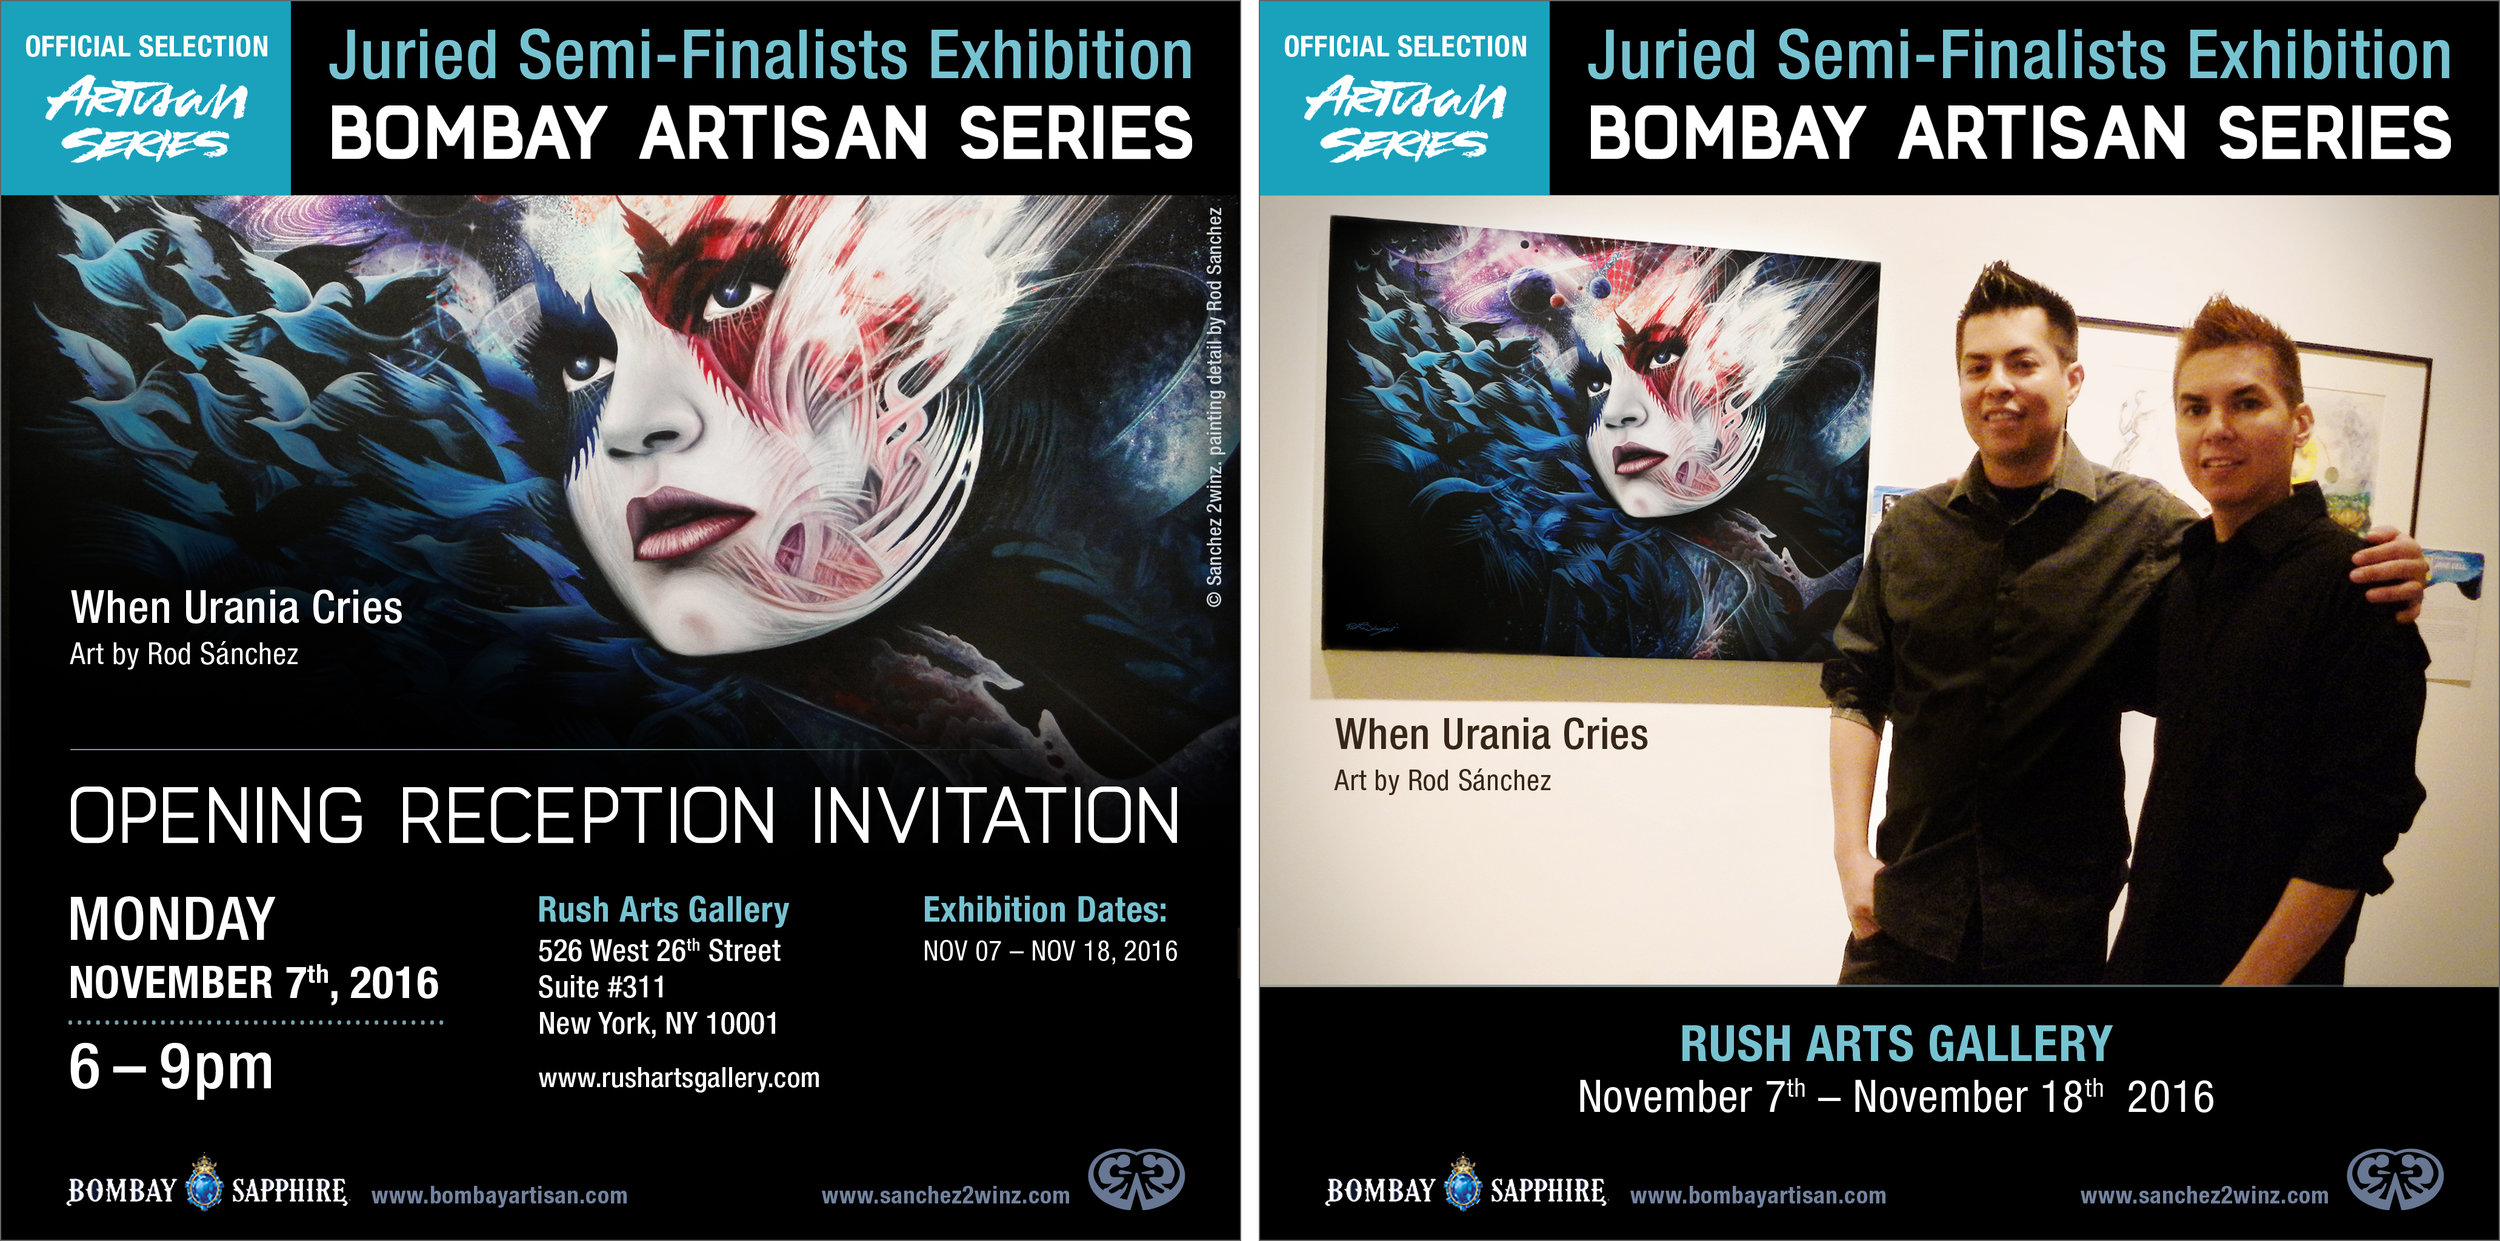 News_BombayArtisanSeriesExhibition_RodSanchez_Sanchez2winz.jpg